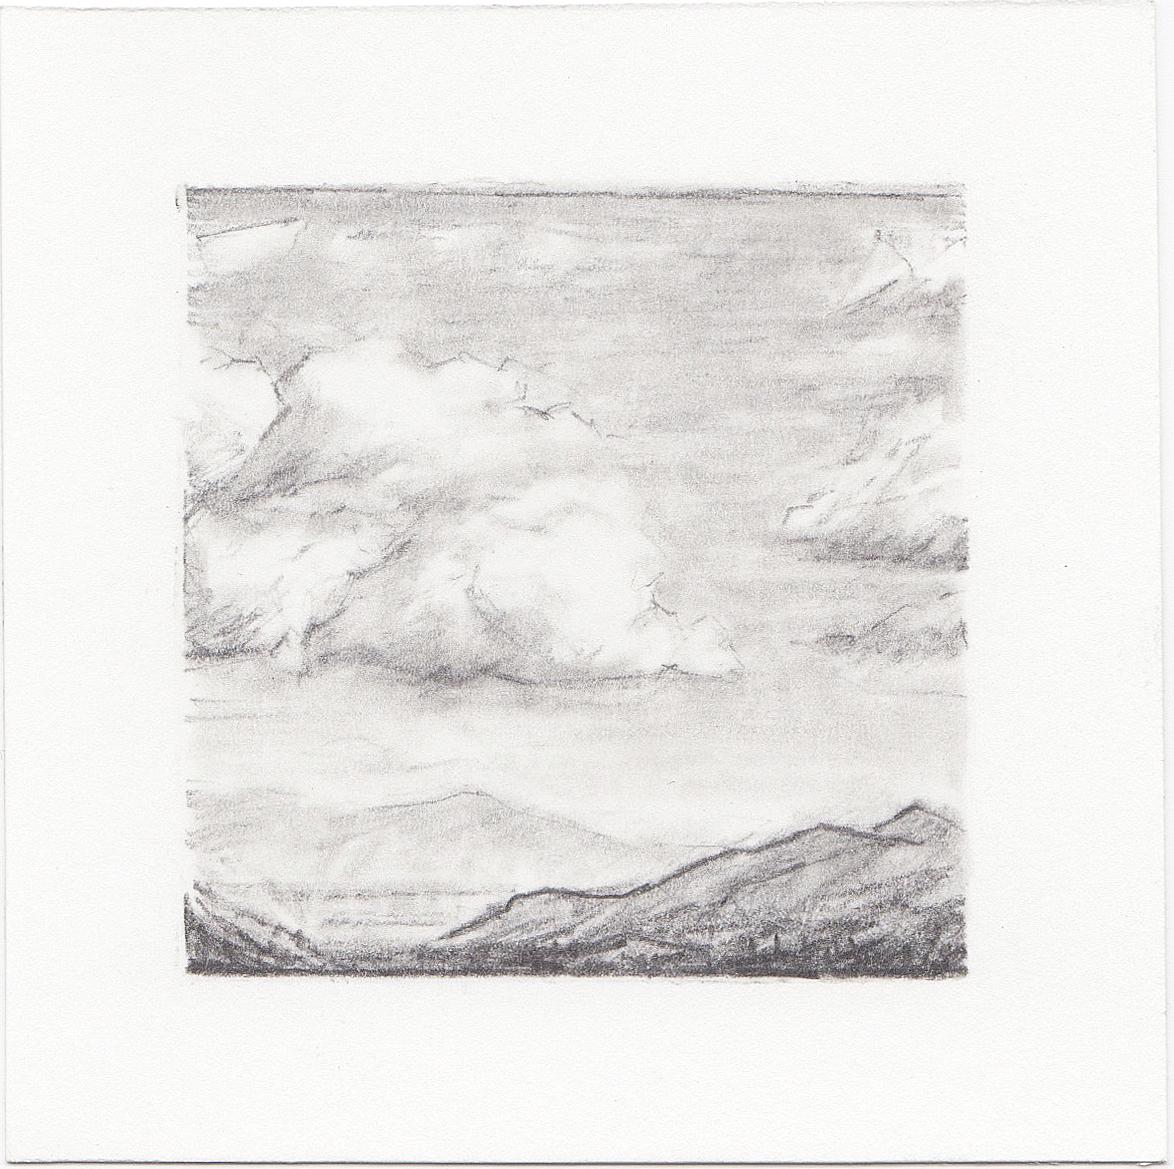 #39 Salt Lake Valley, Utah | 3x3 | graphite